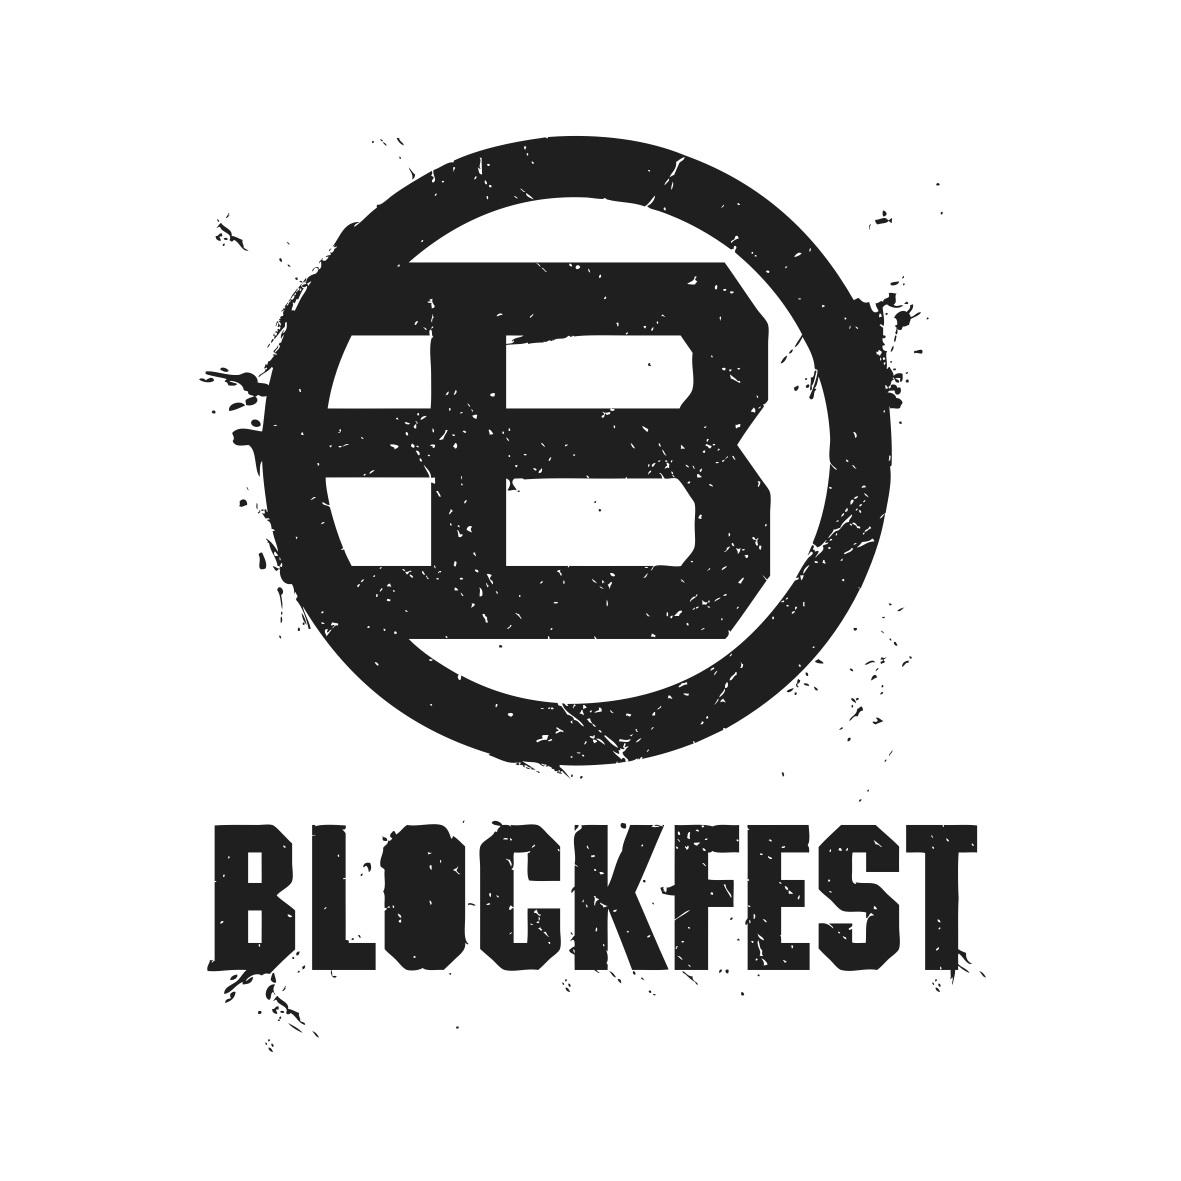 Se o Blockfest HUH!